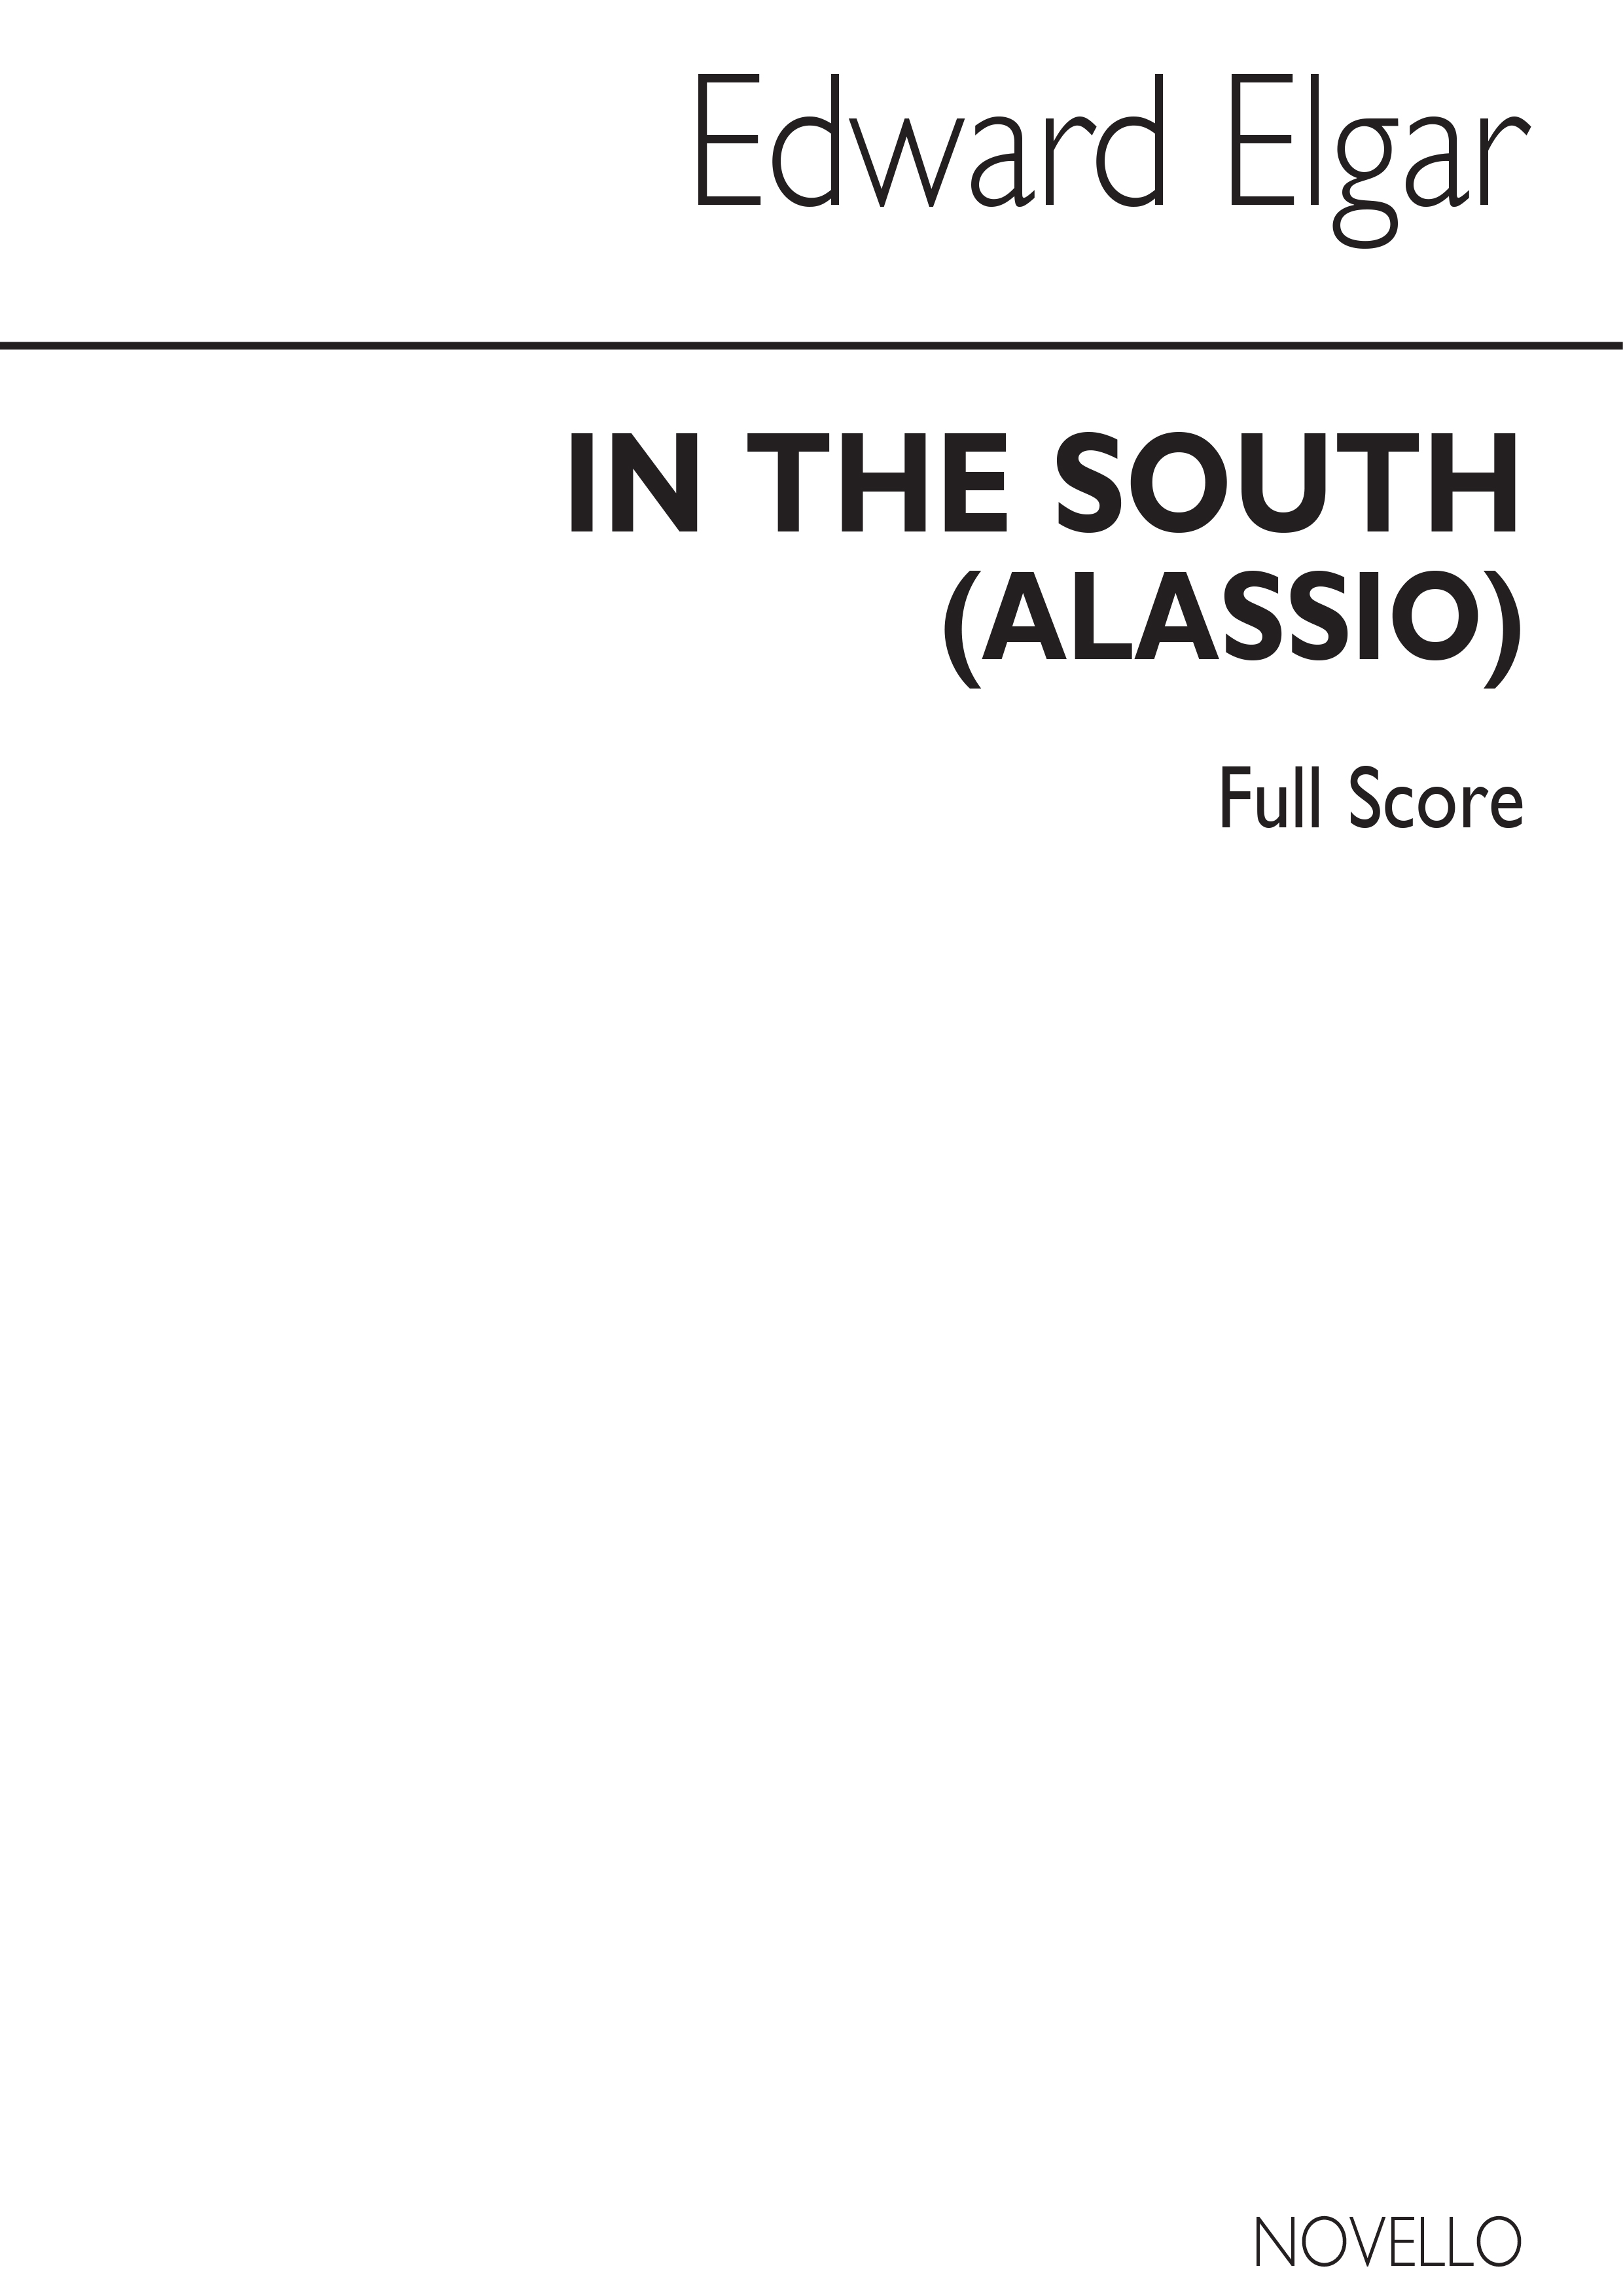 Edward Elgar: In The South Overture (Alassio) - Full Score: Orchestra: Score